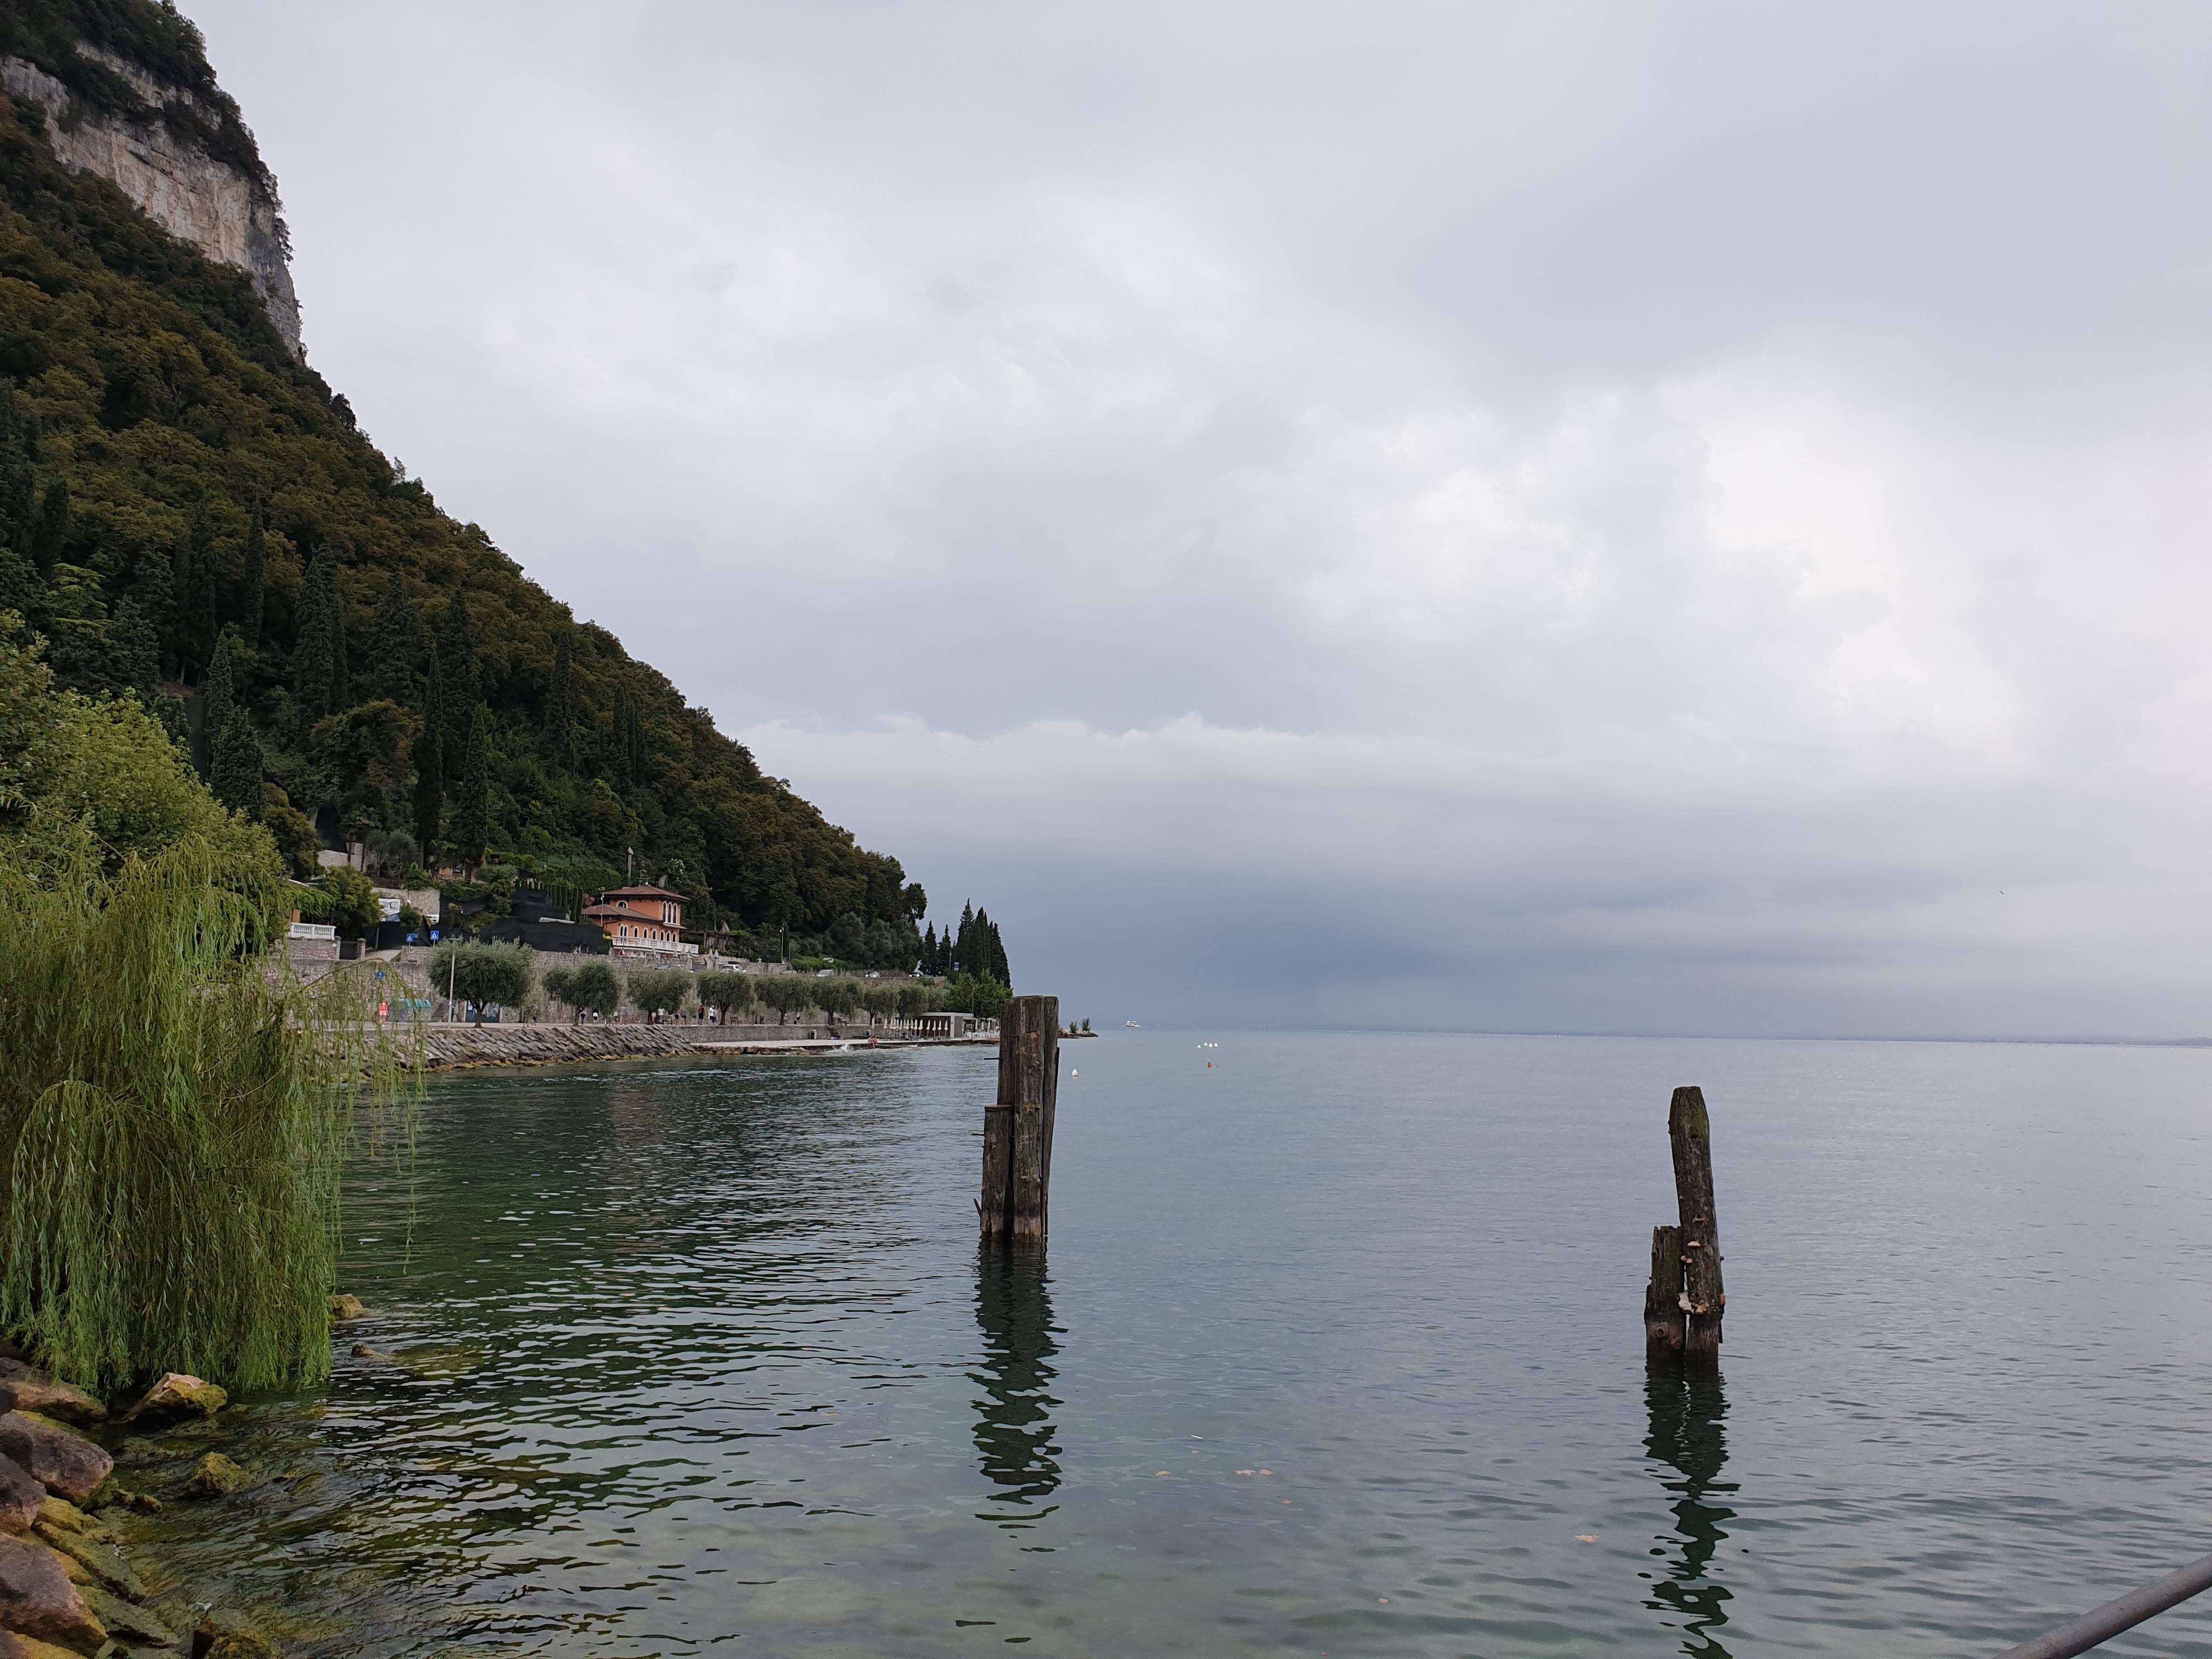 Parco al lago di Garda